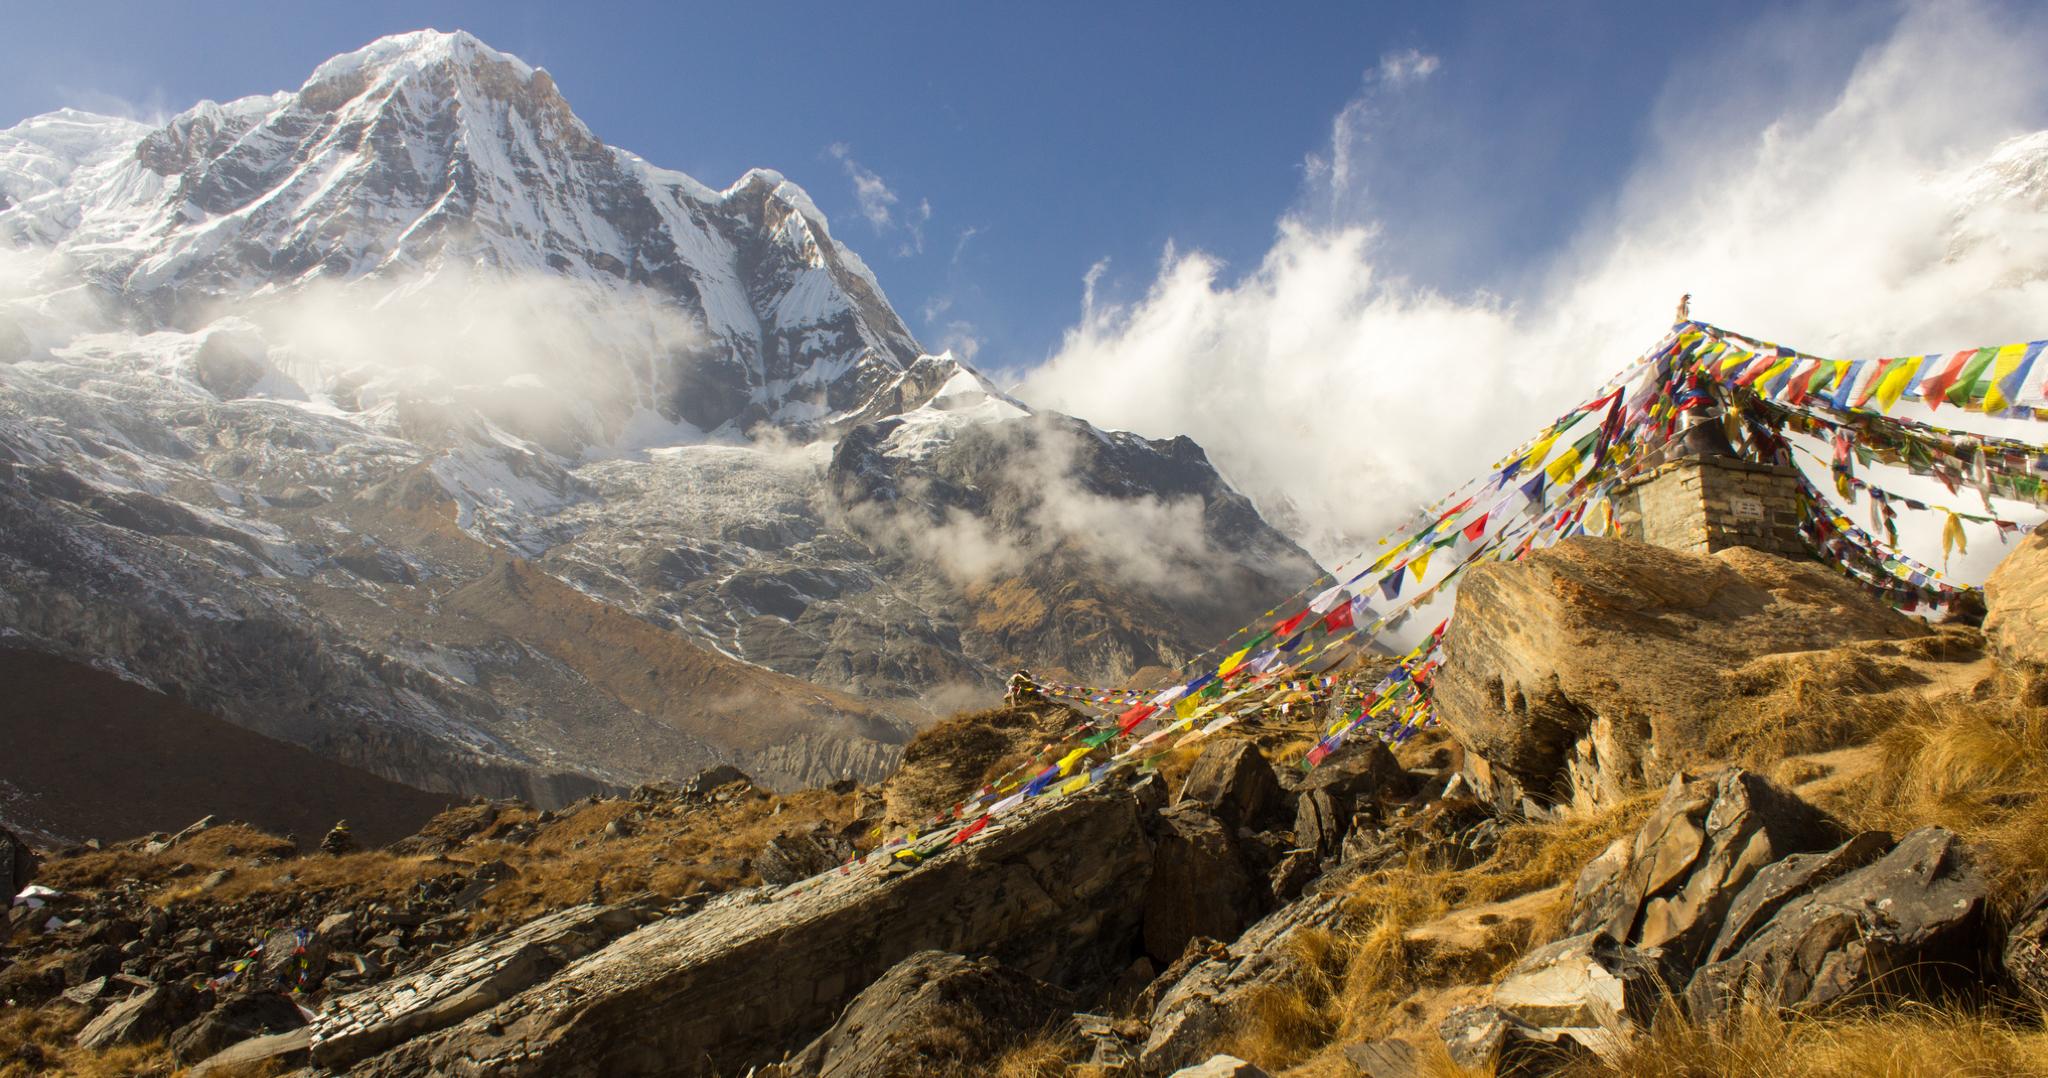 Annapurna Base Camp Flickr_Matt Zimmerman